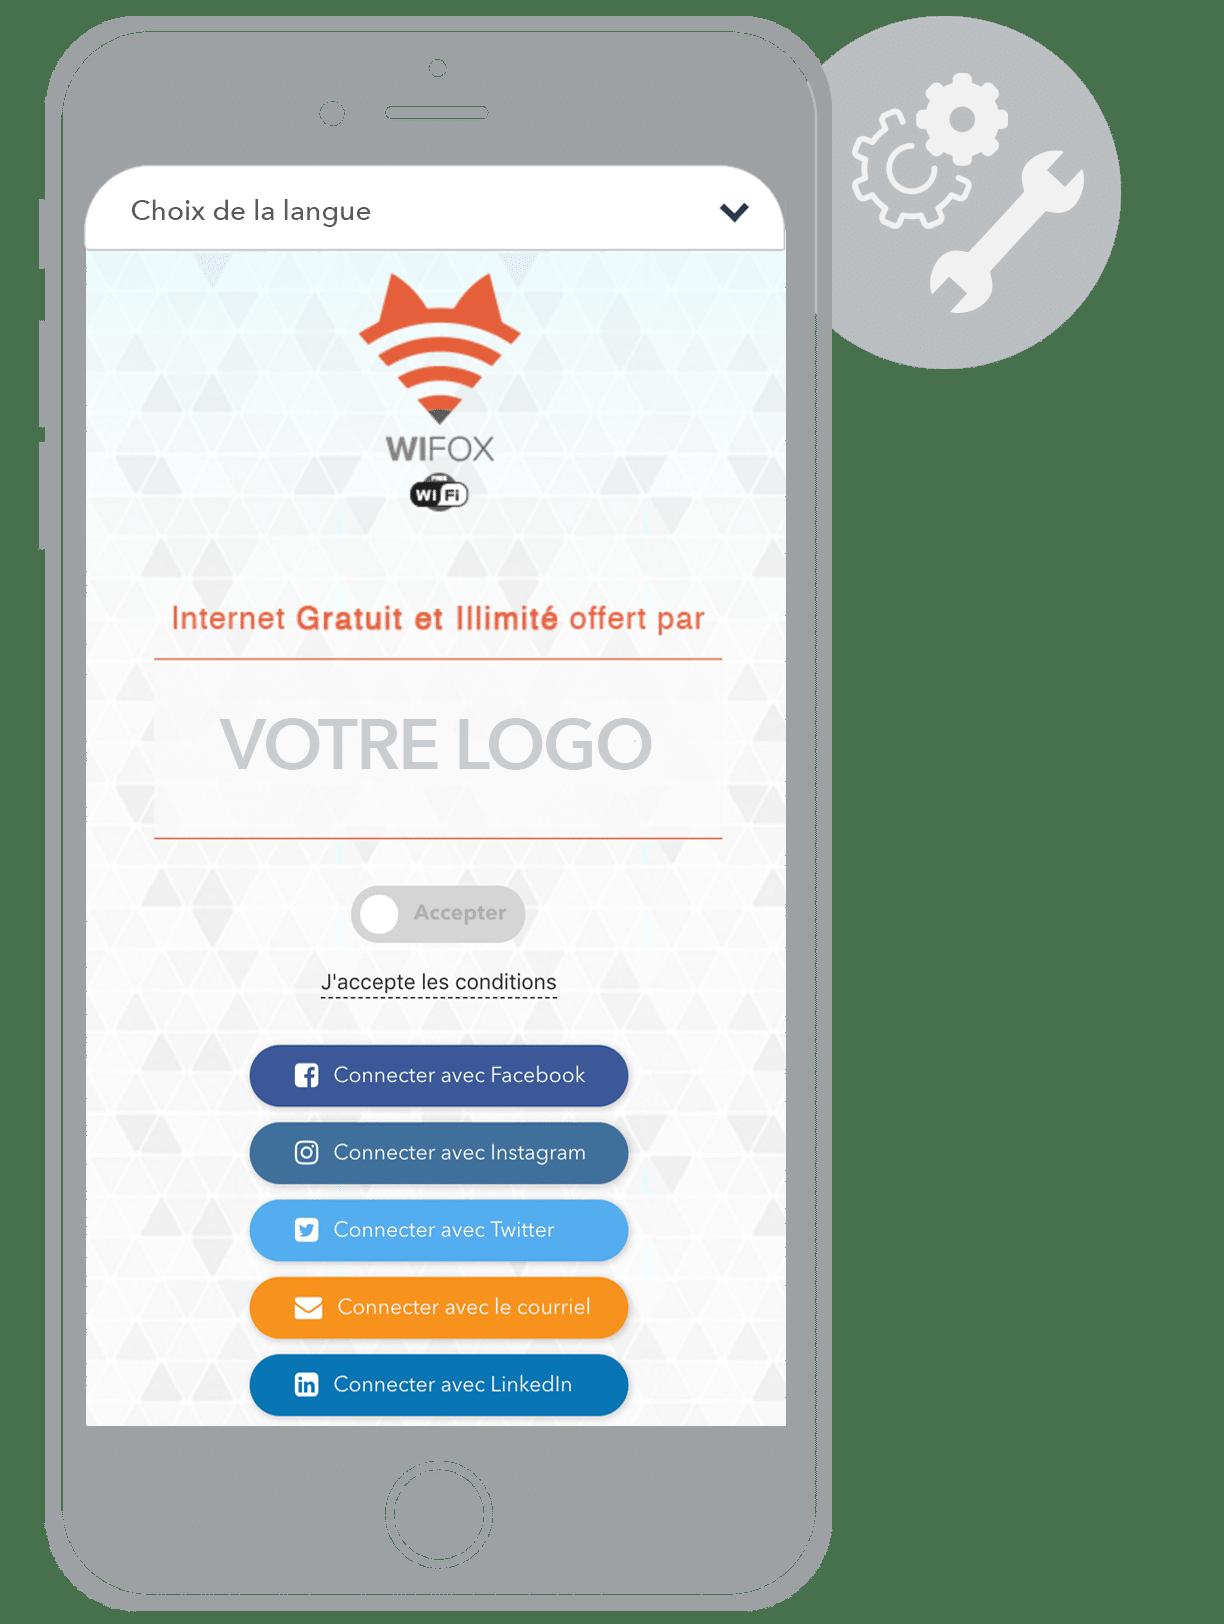 interfacewifox